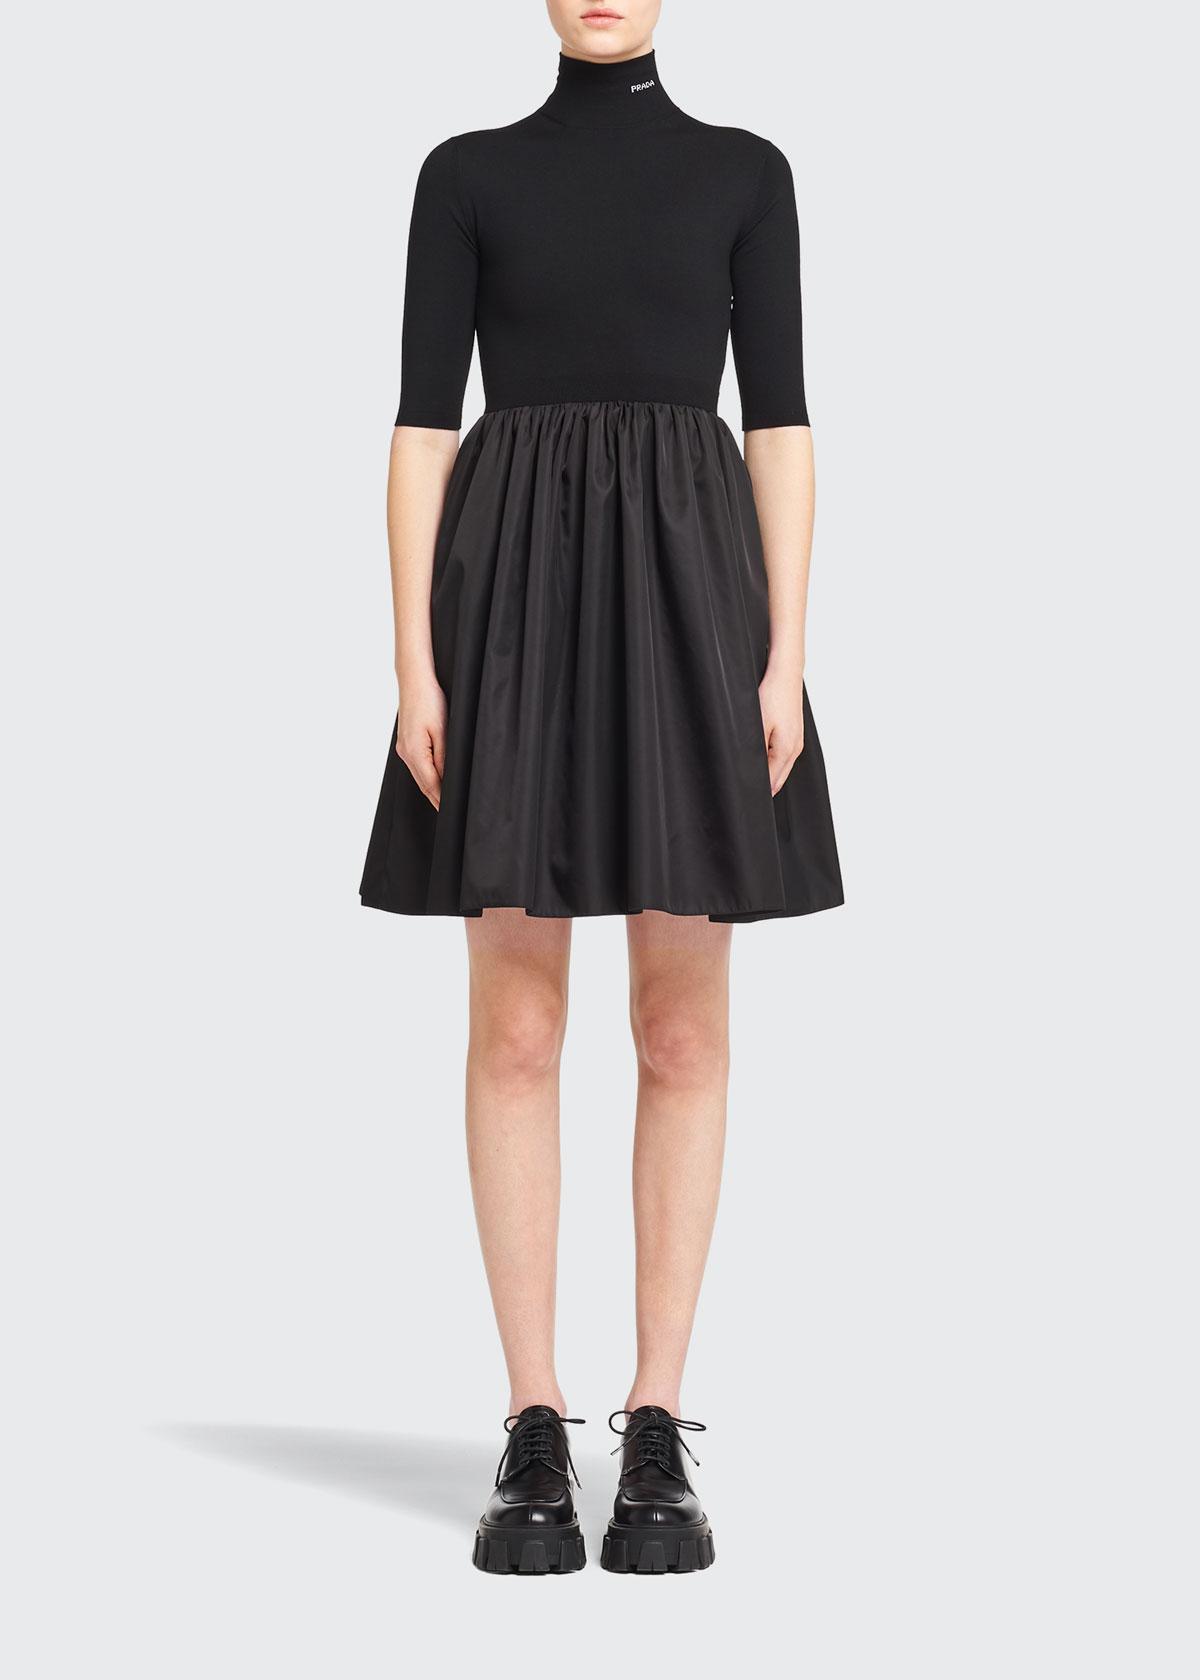 Prada RE-NYLON FIT-&-FLARE DRESS